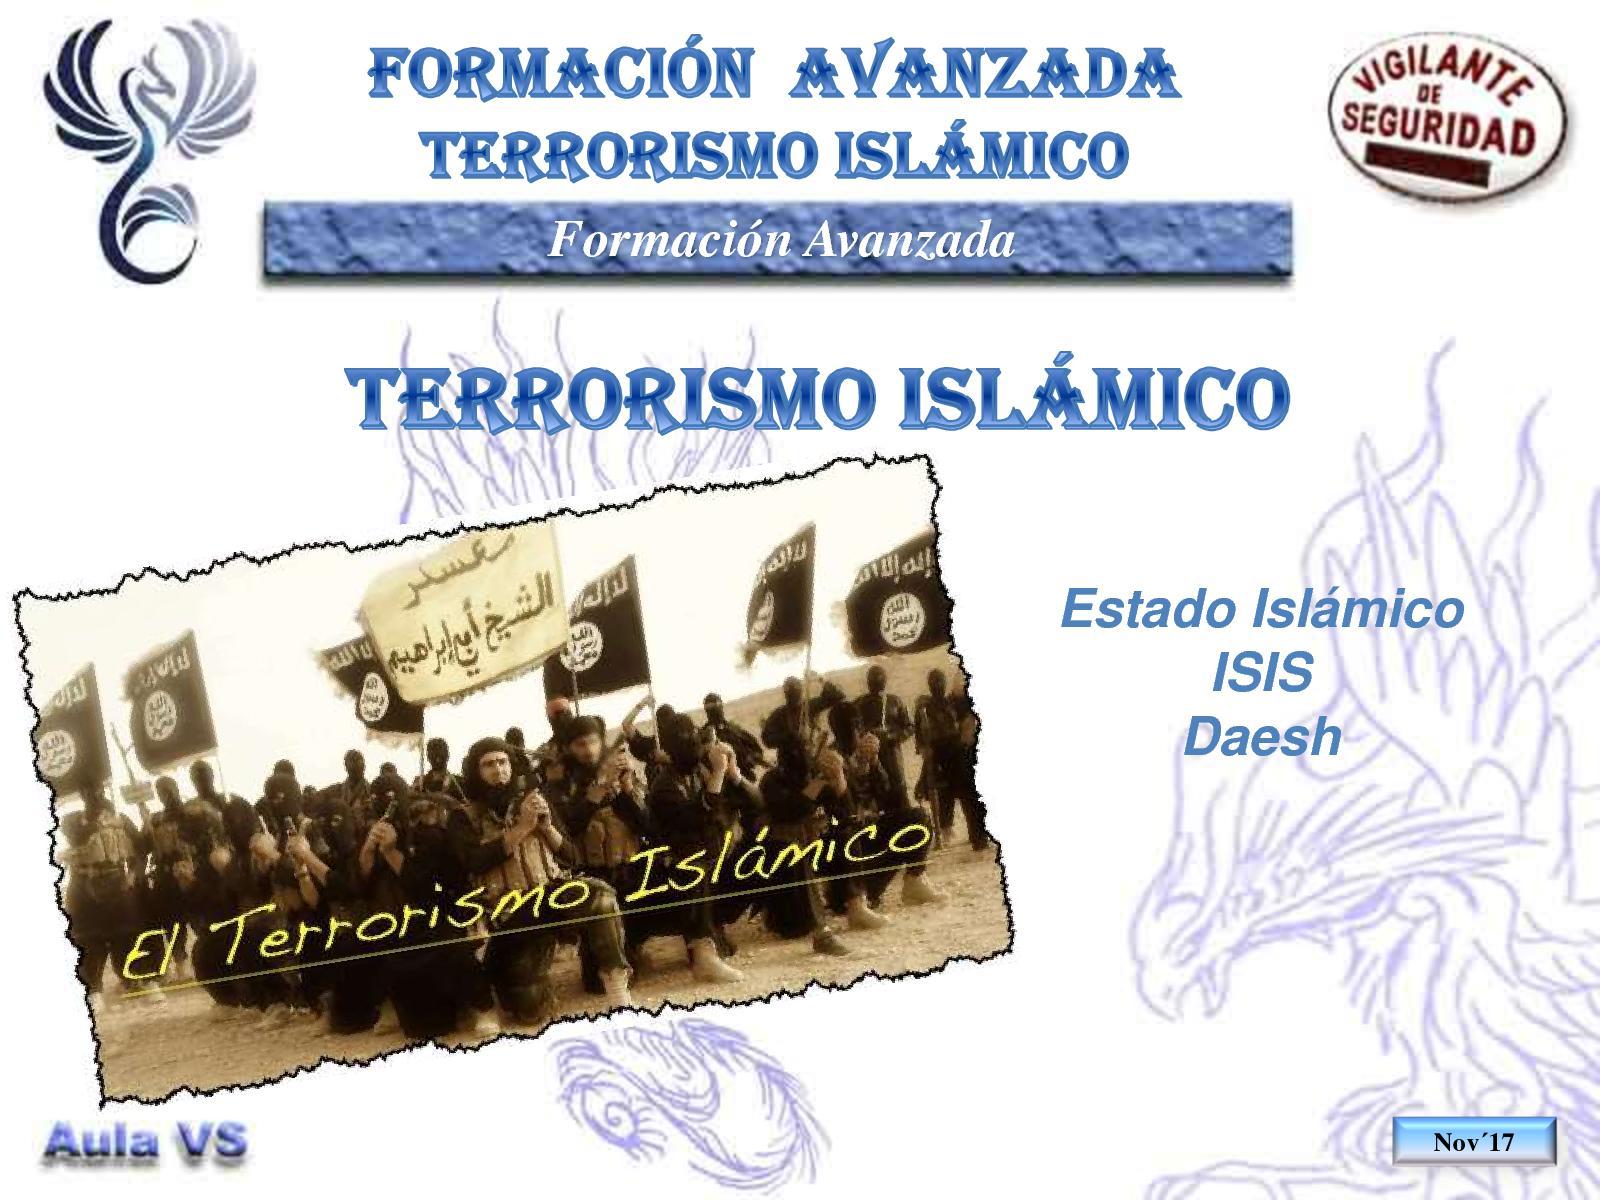 TI50 - Estado Islamico